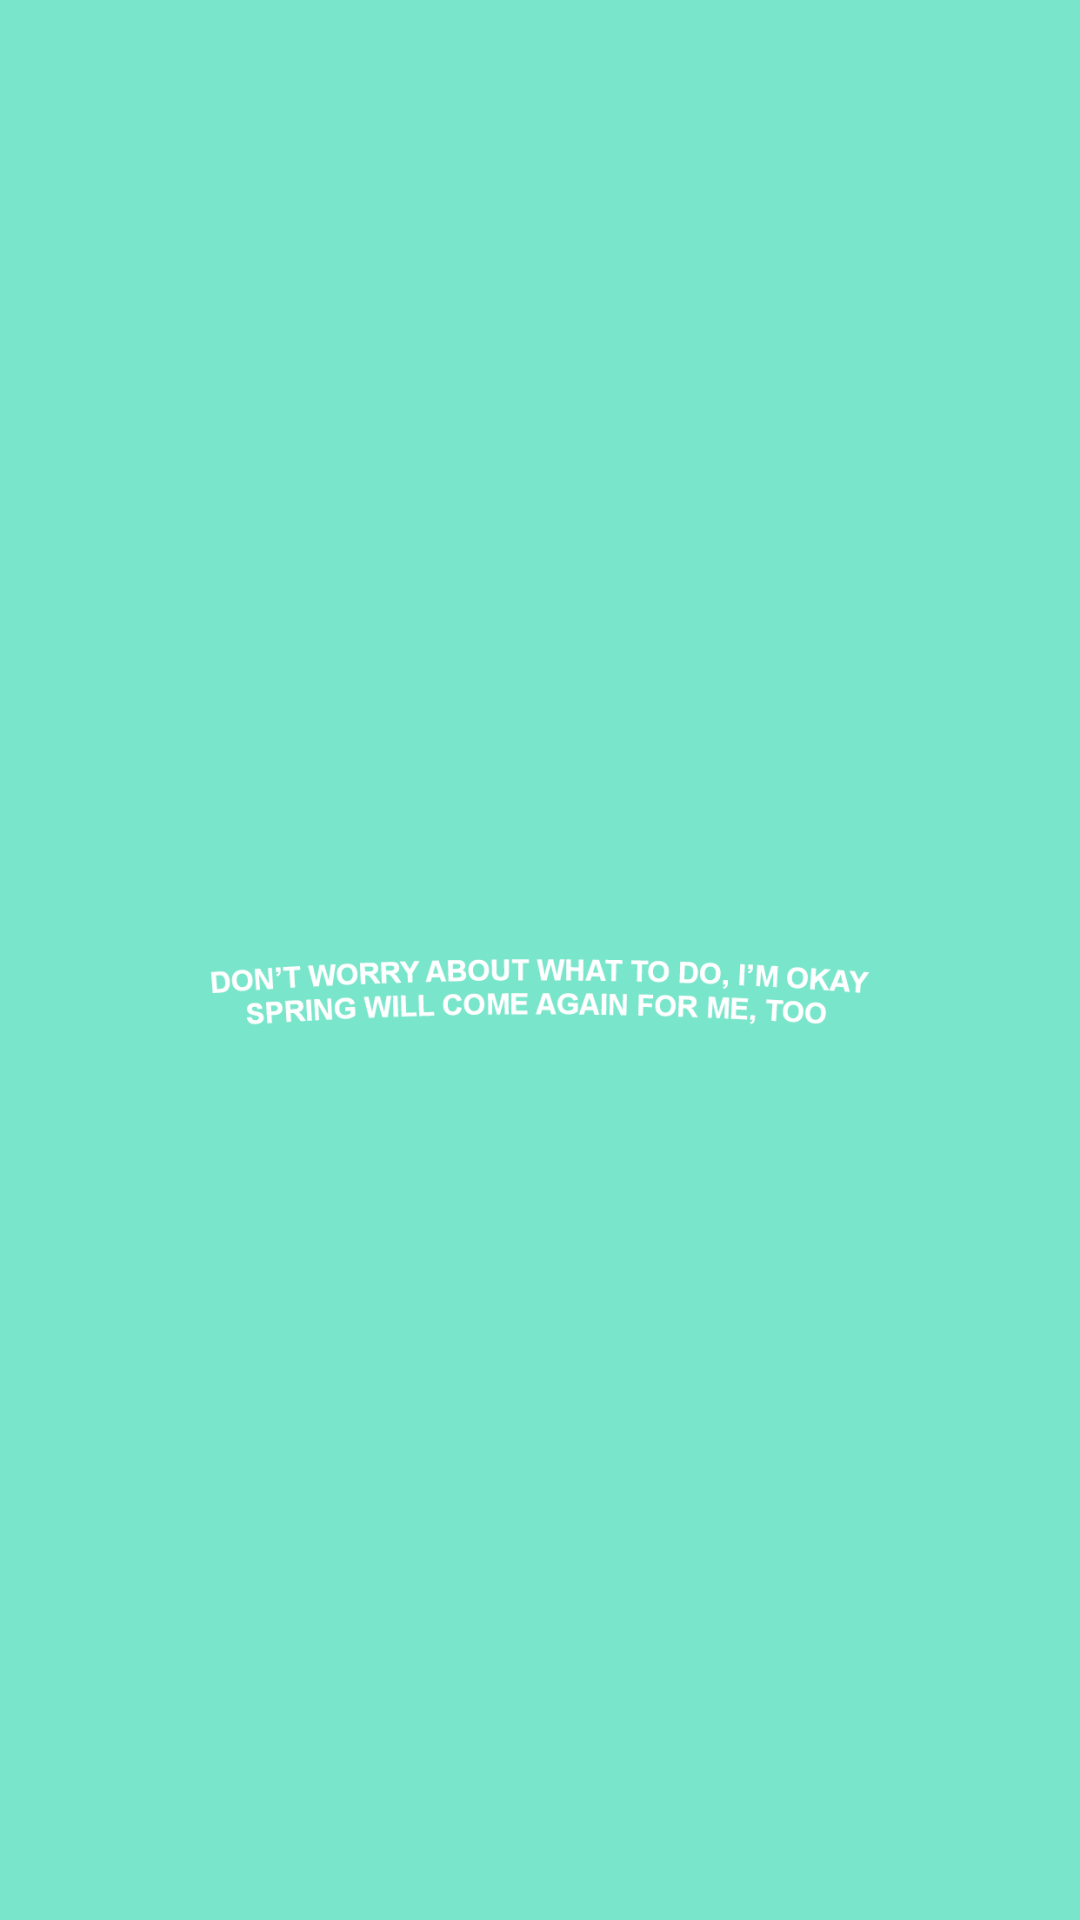 jonghyun lyrics wallpaper | Tumblr